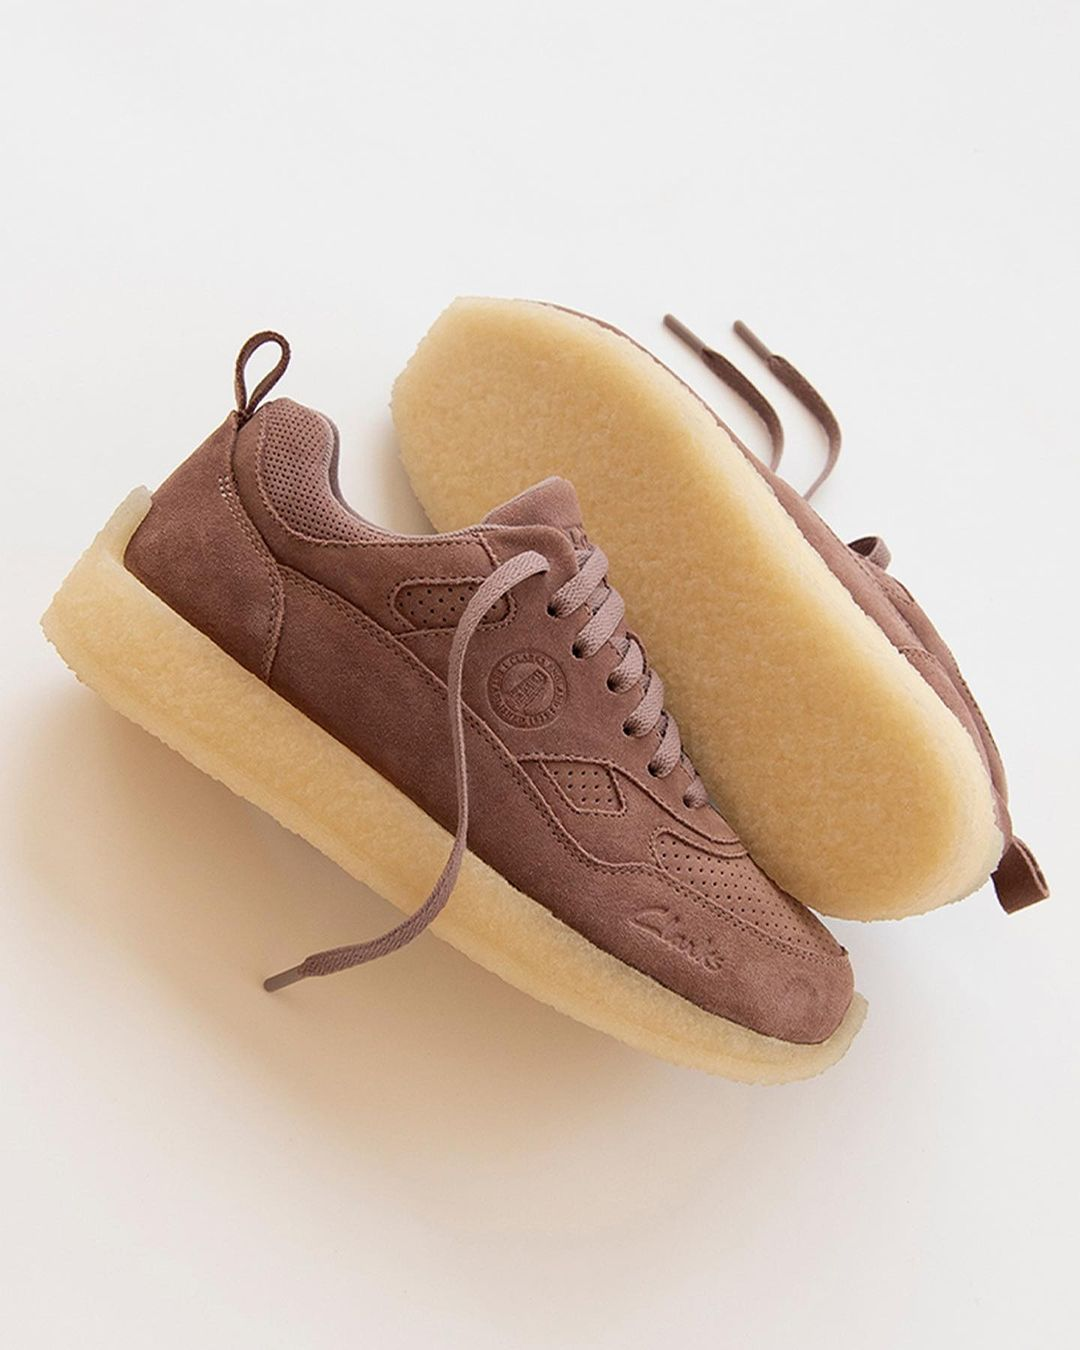 Kith,Ronnie Fieg,CLARKS ORIGIN  麂皮鞋身太有质感了吧!KITH 全新联名鞋款即将发售!